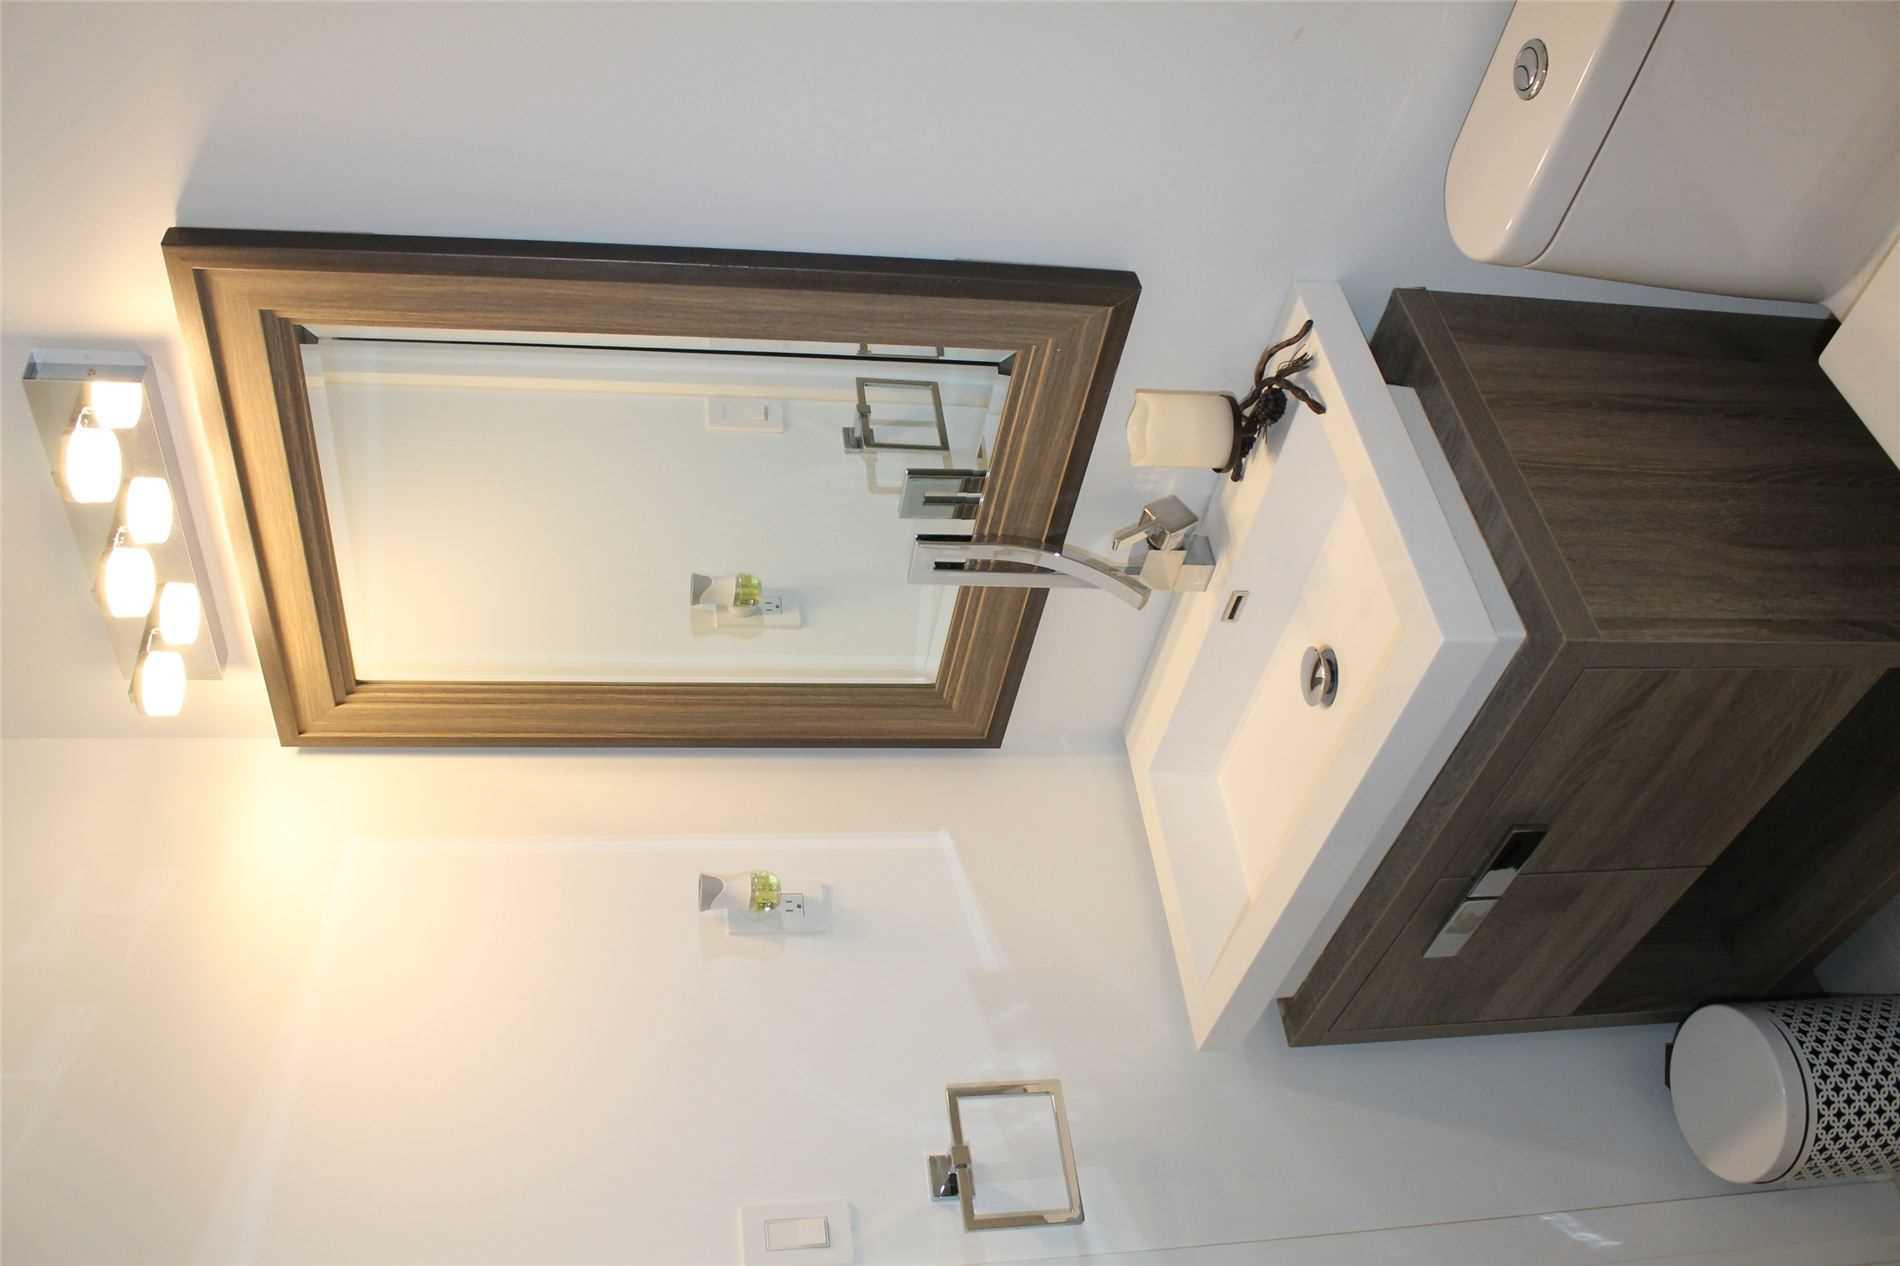 92 Montressor Dr, Toronto, Ontario M2P1Z4, 3 Bedrooms Bedrooms, 7 Rooms Rooms,4 BathroomsBathrooms,Detached,For Sale,Montressor,C5153142